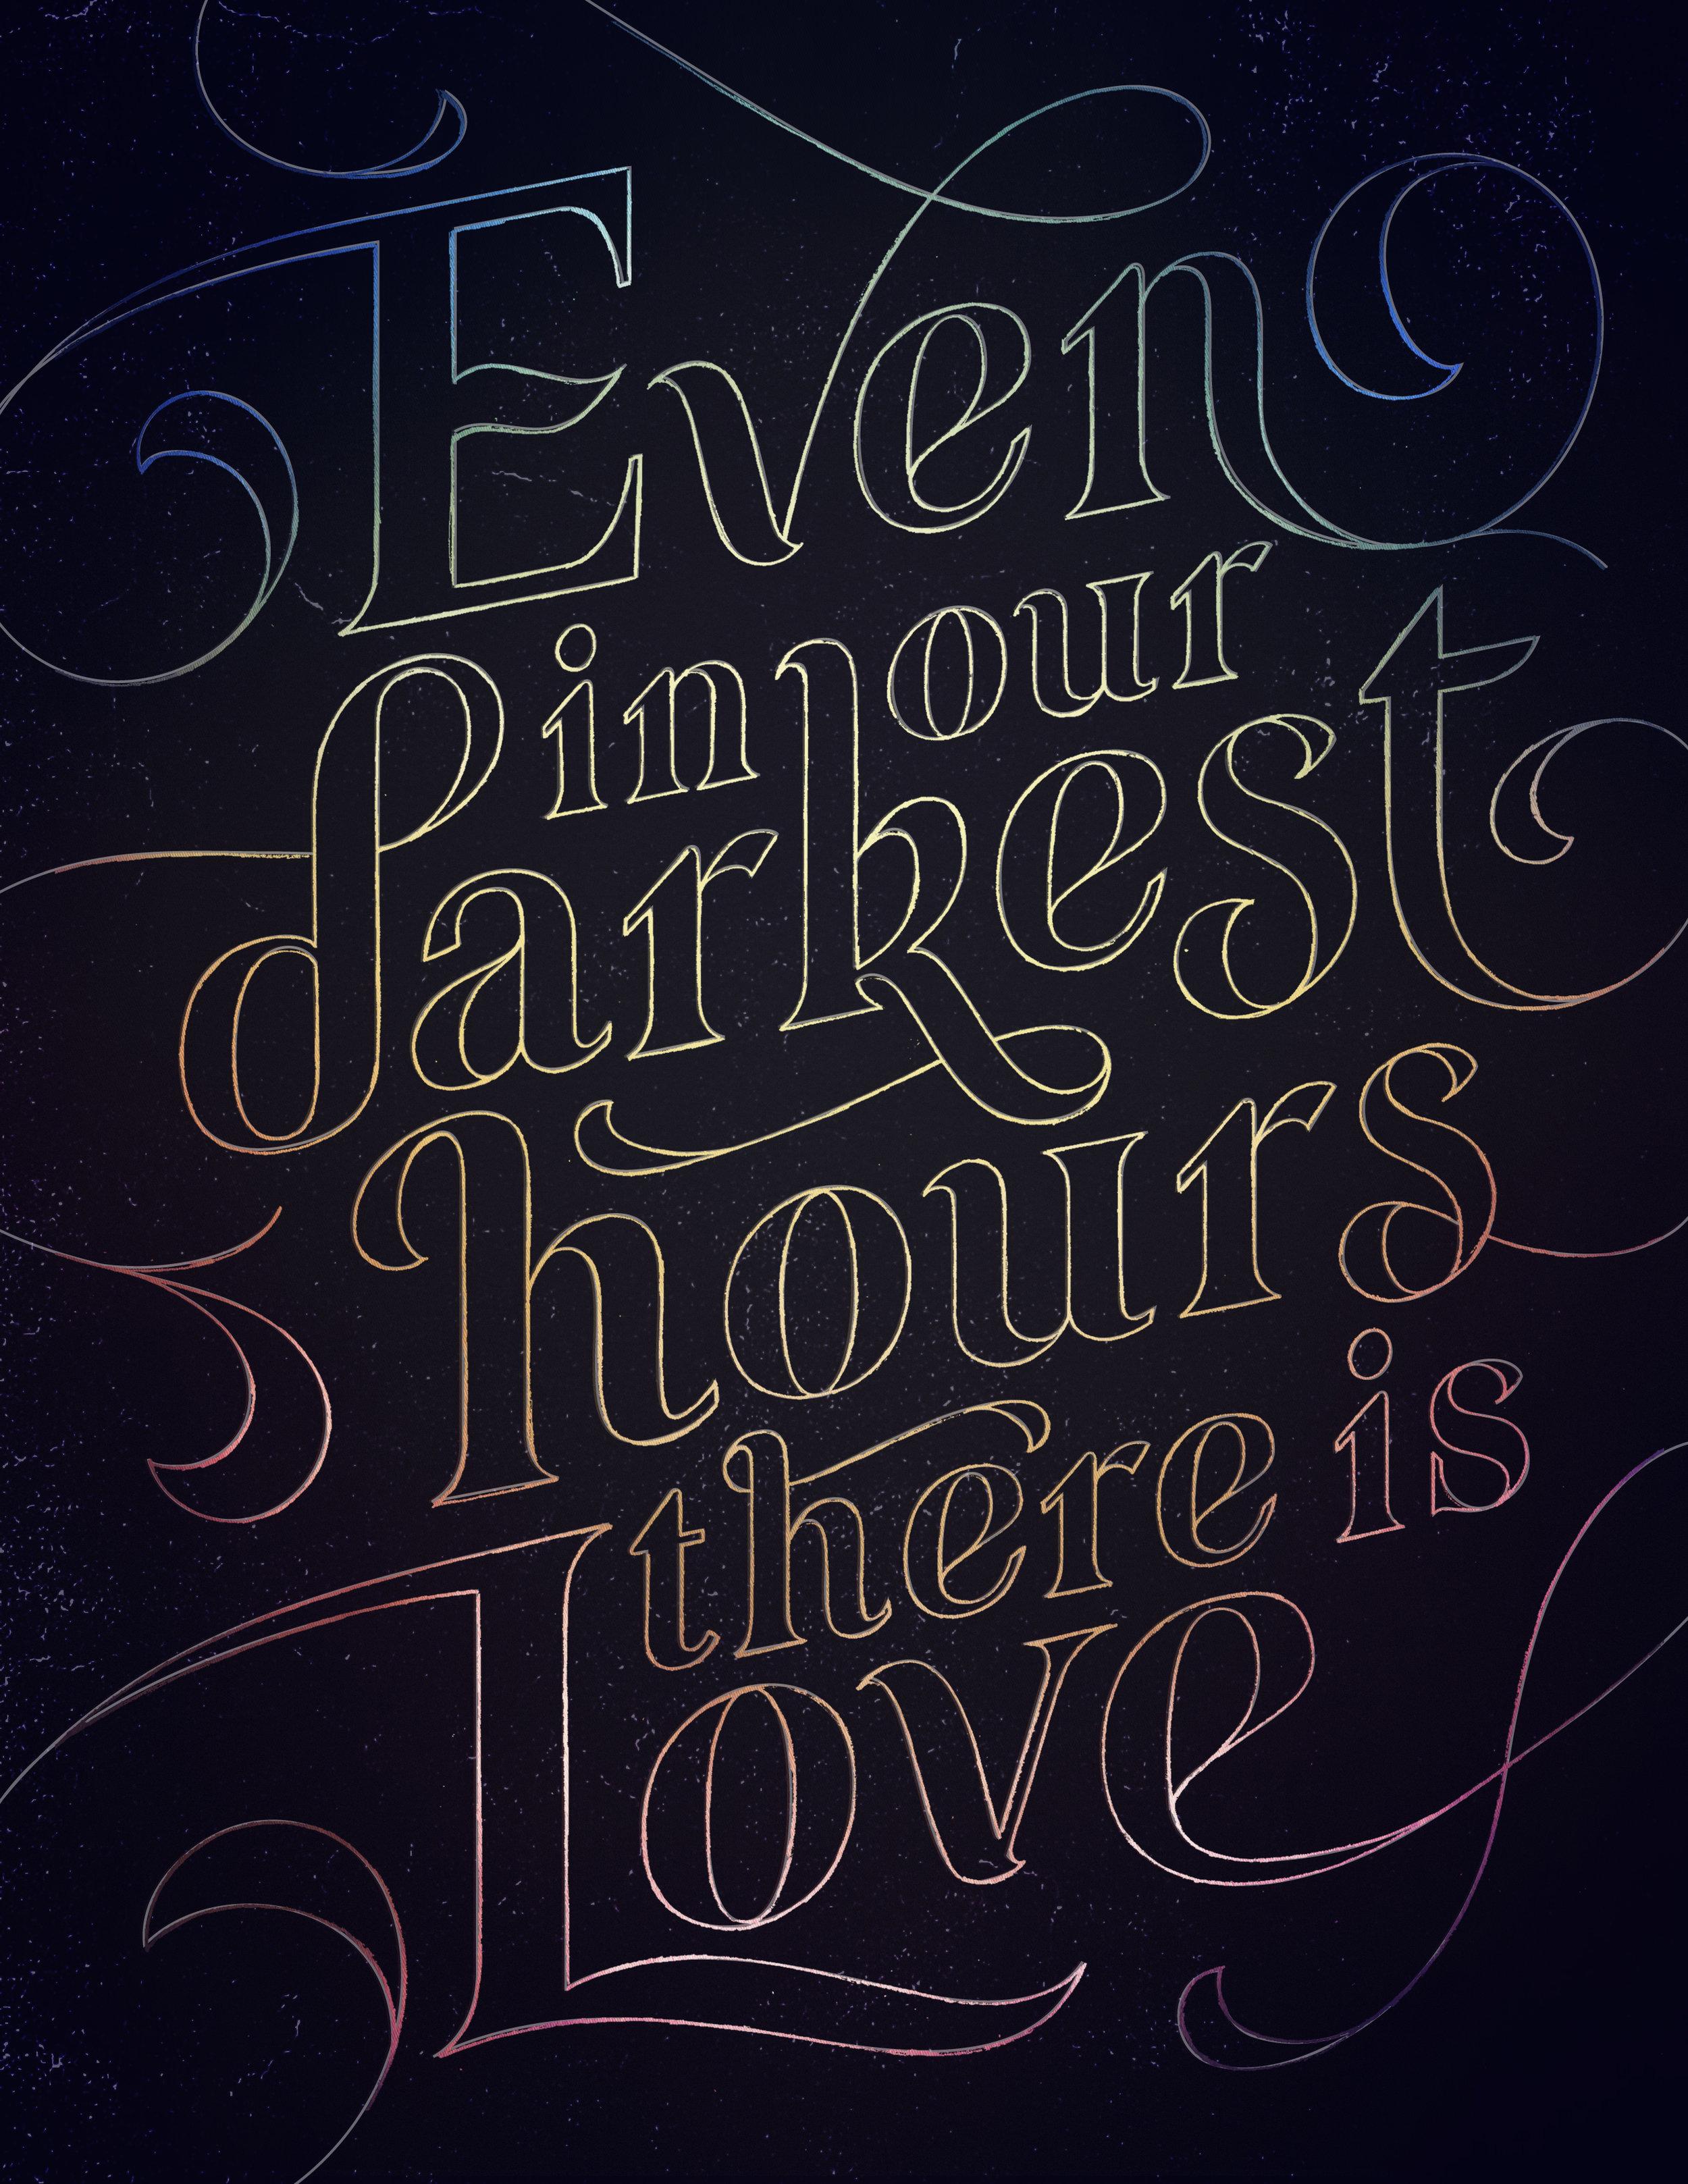 darkesthours3.jpg